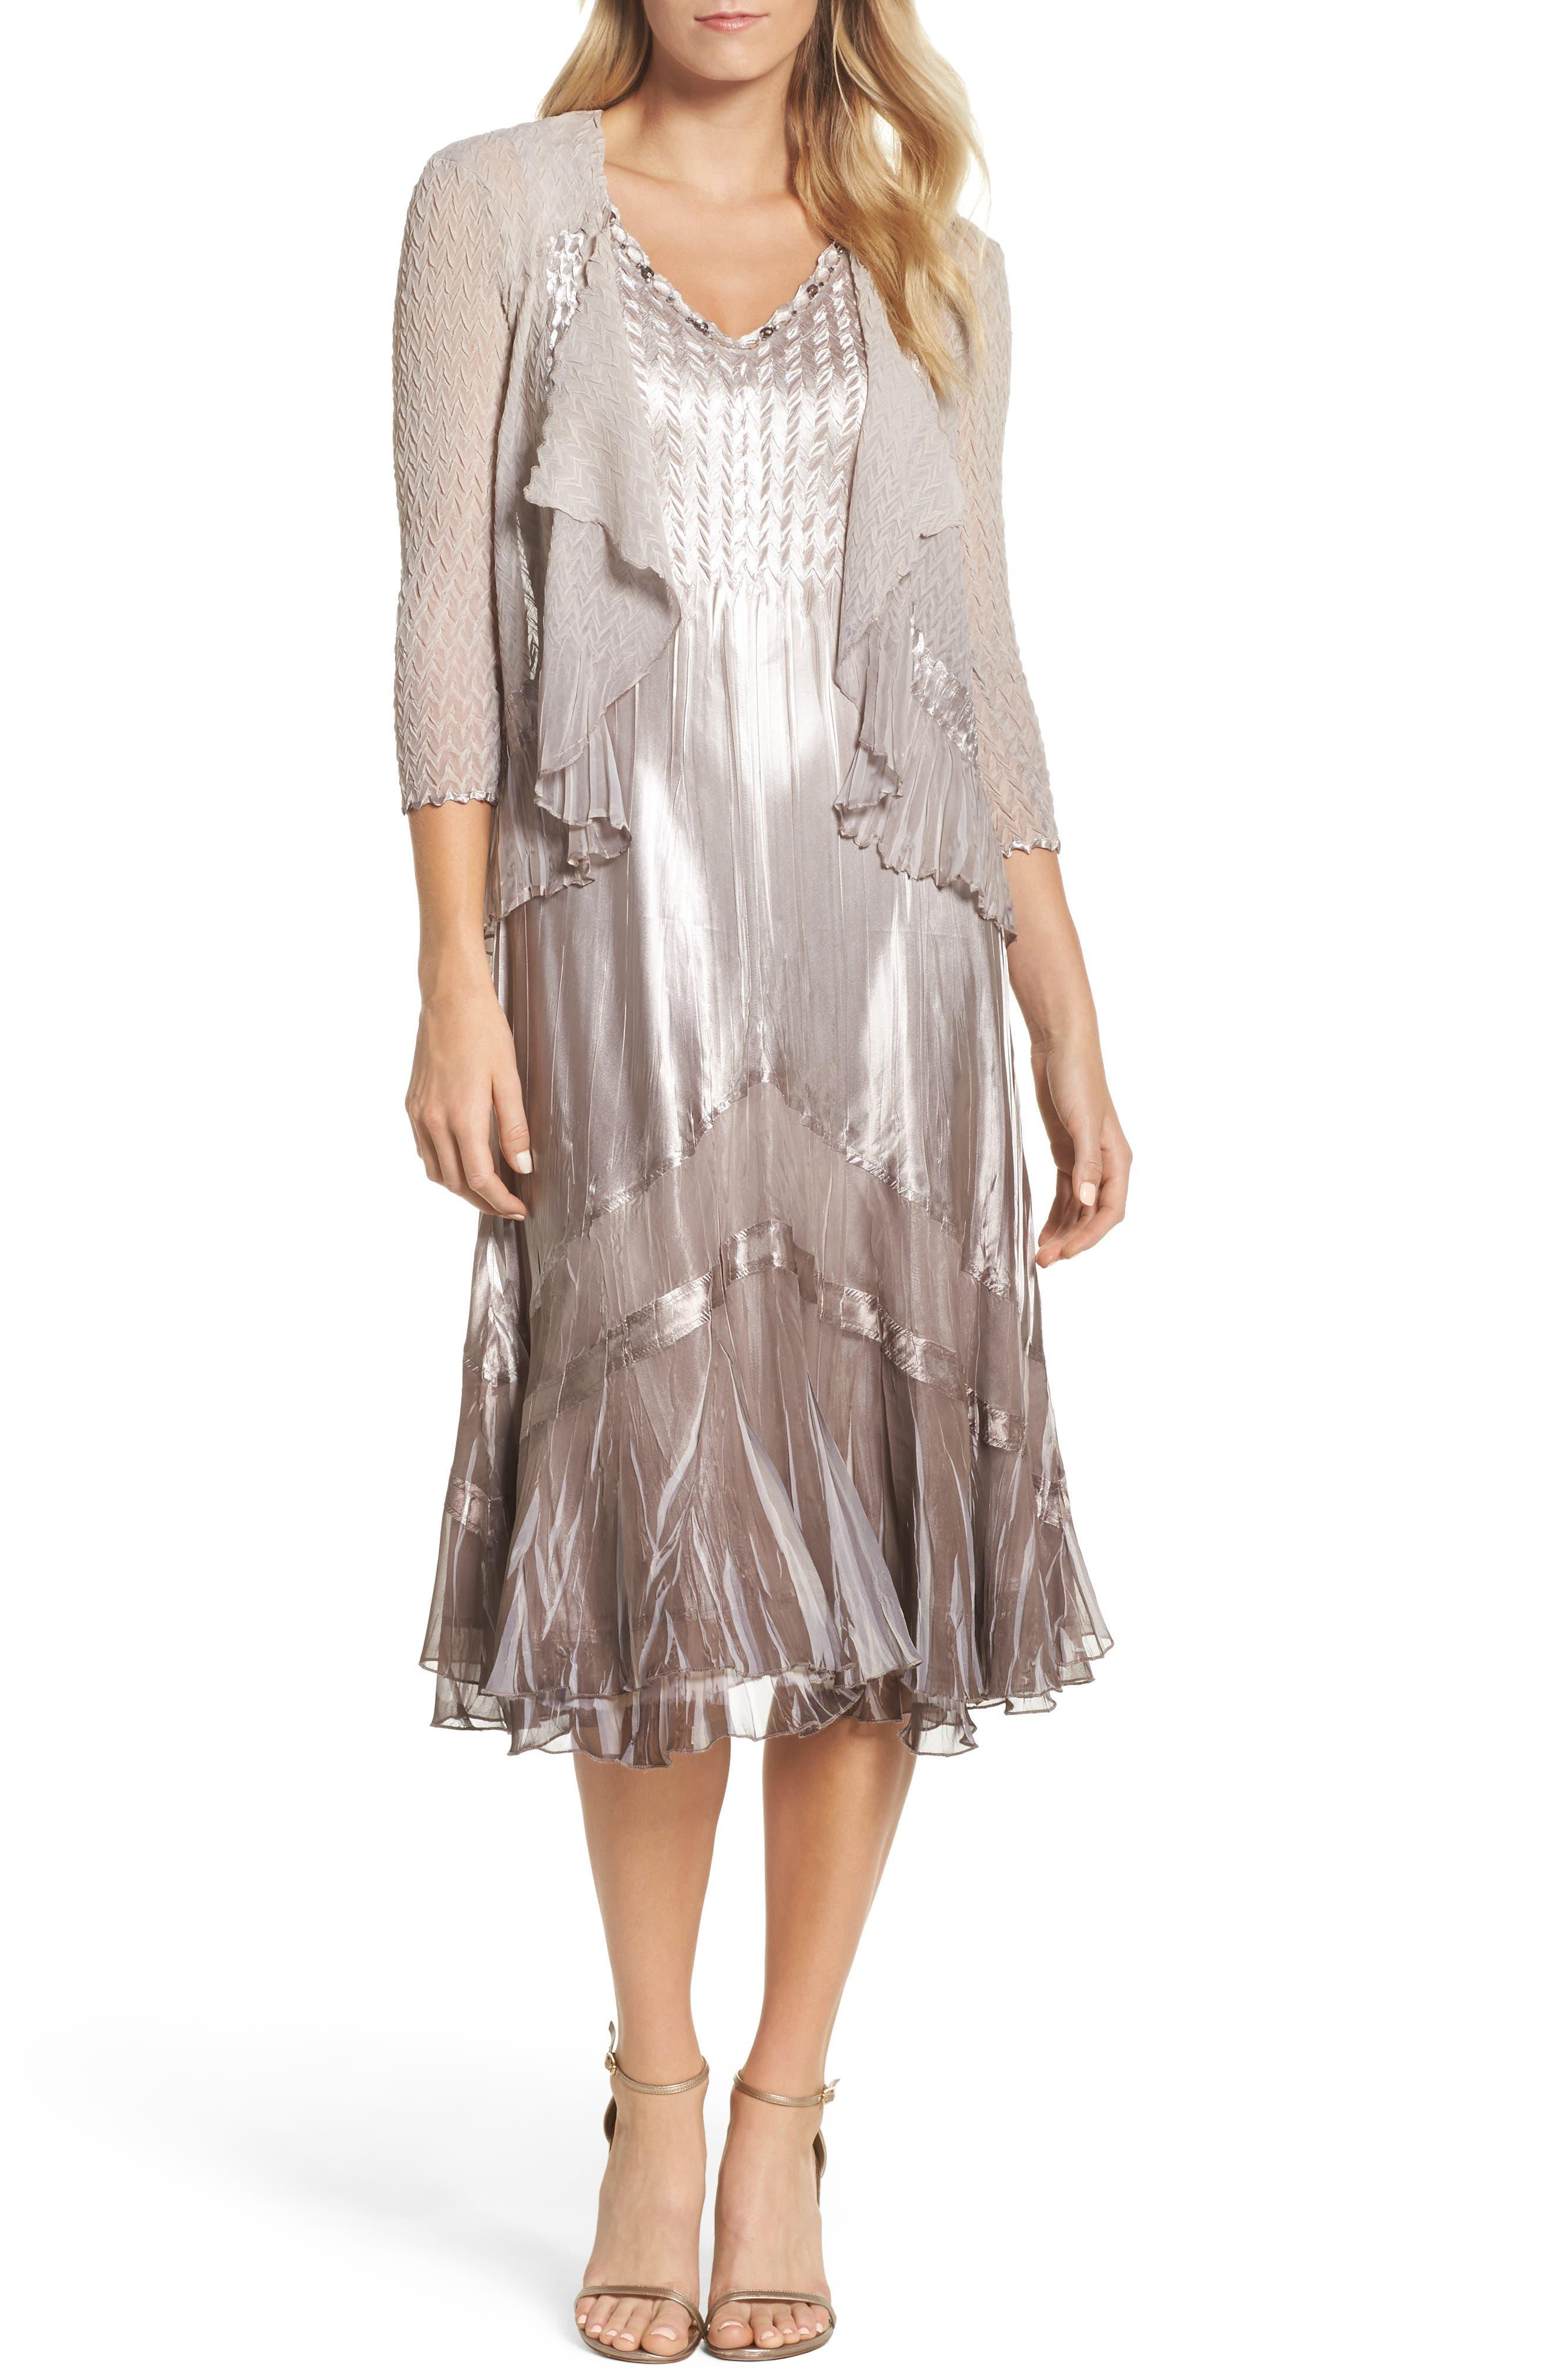 Alternate Image 1 Selected - Komarov Beaded Charmeuse & Chiffon Midi Dress with Jacket  (Regular & Petite)